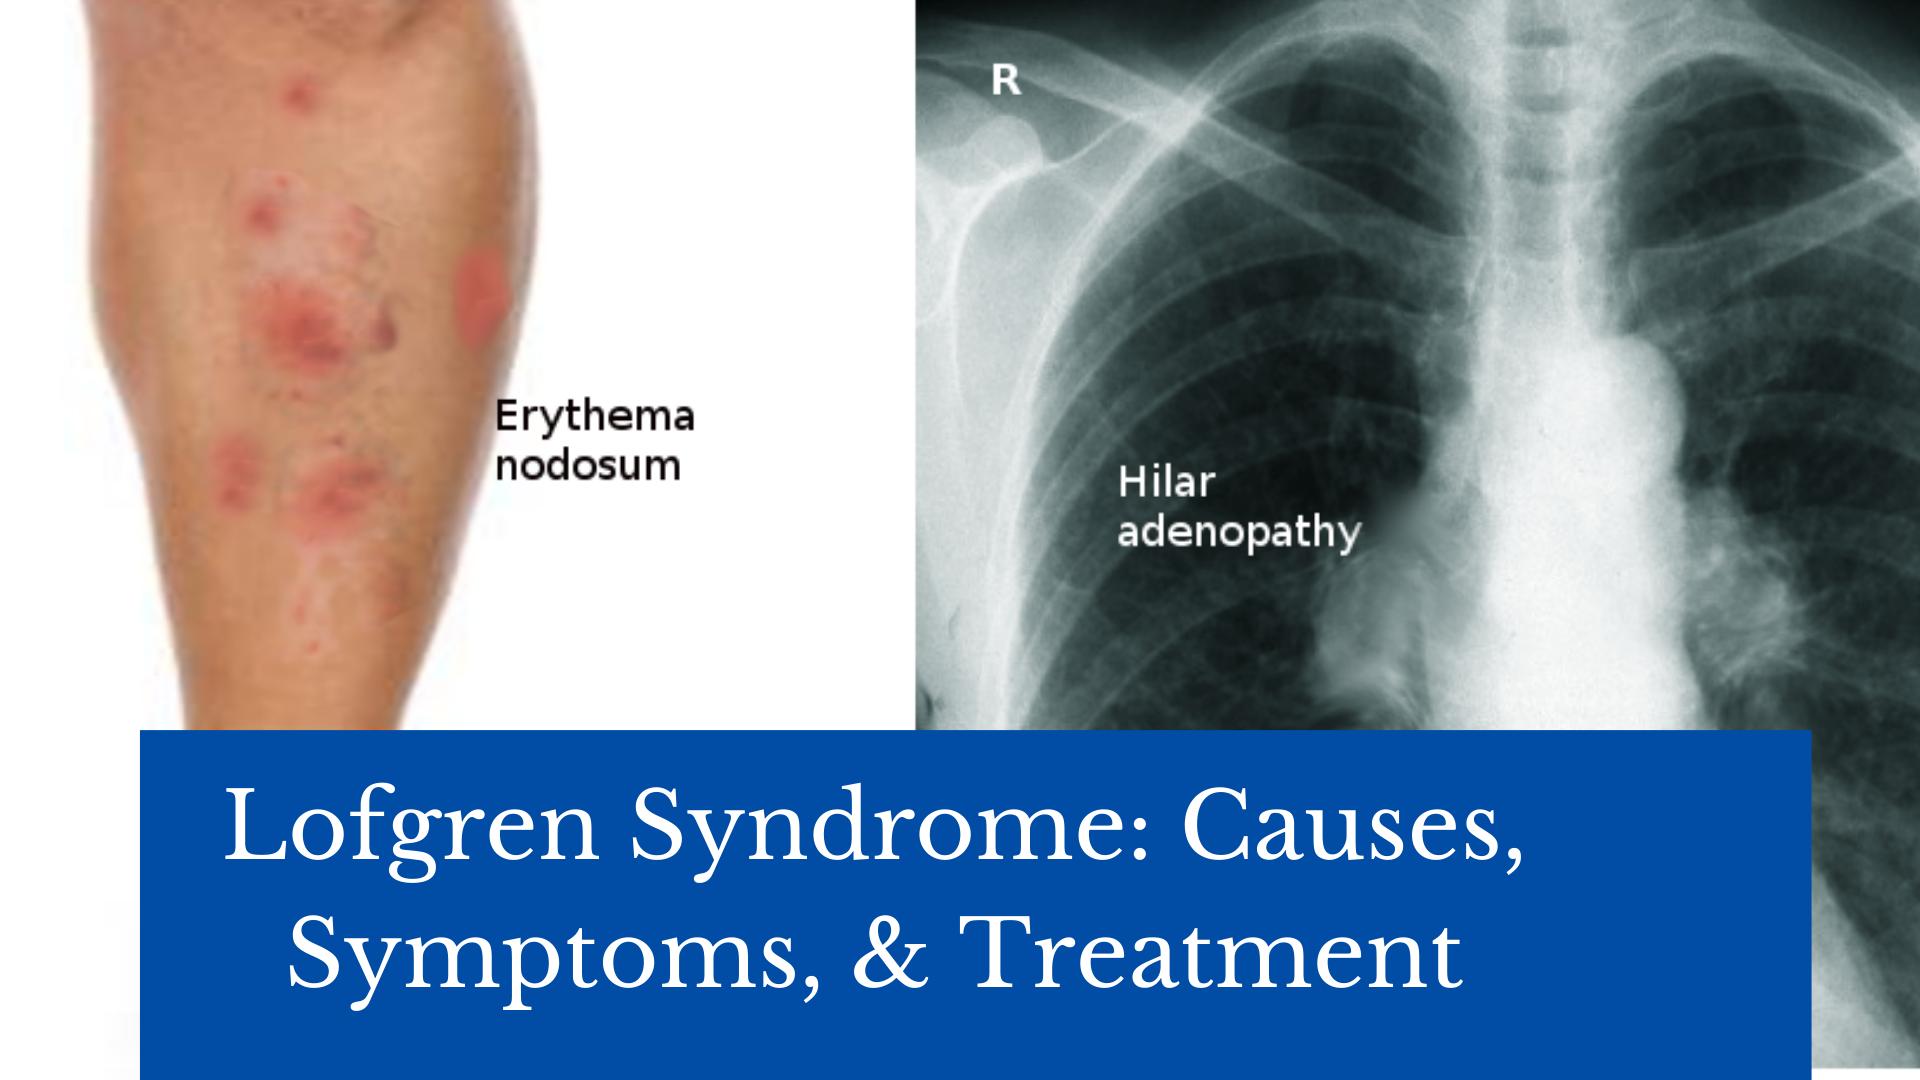 Lofgren Syndrome: Causes, Symptoms, & Treatment 21 - Daily Medicos